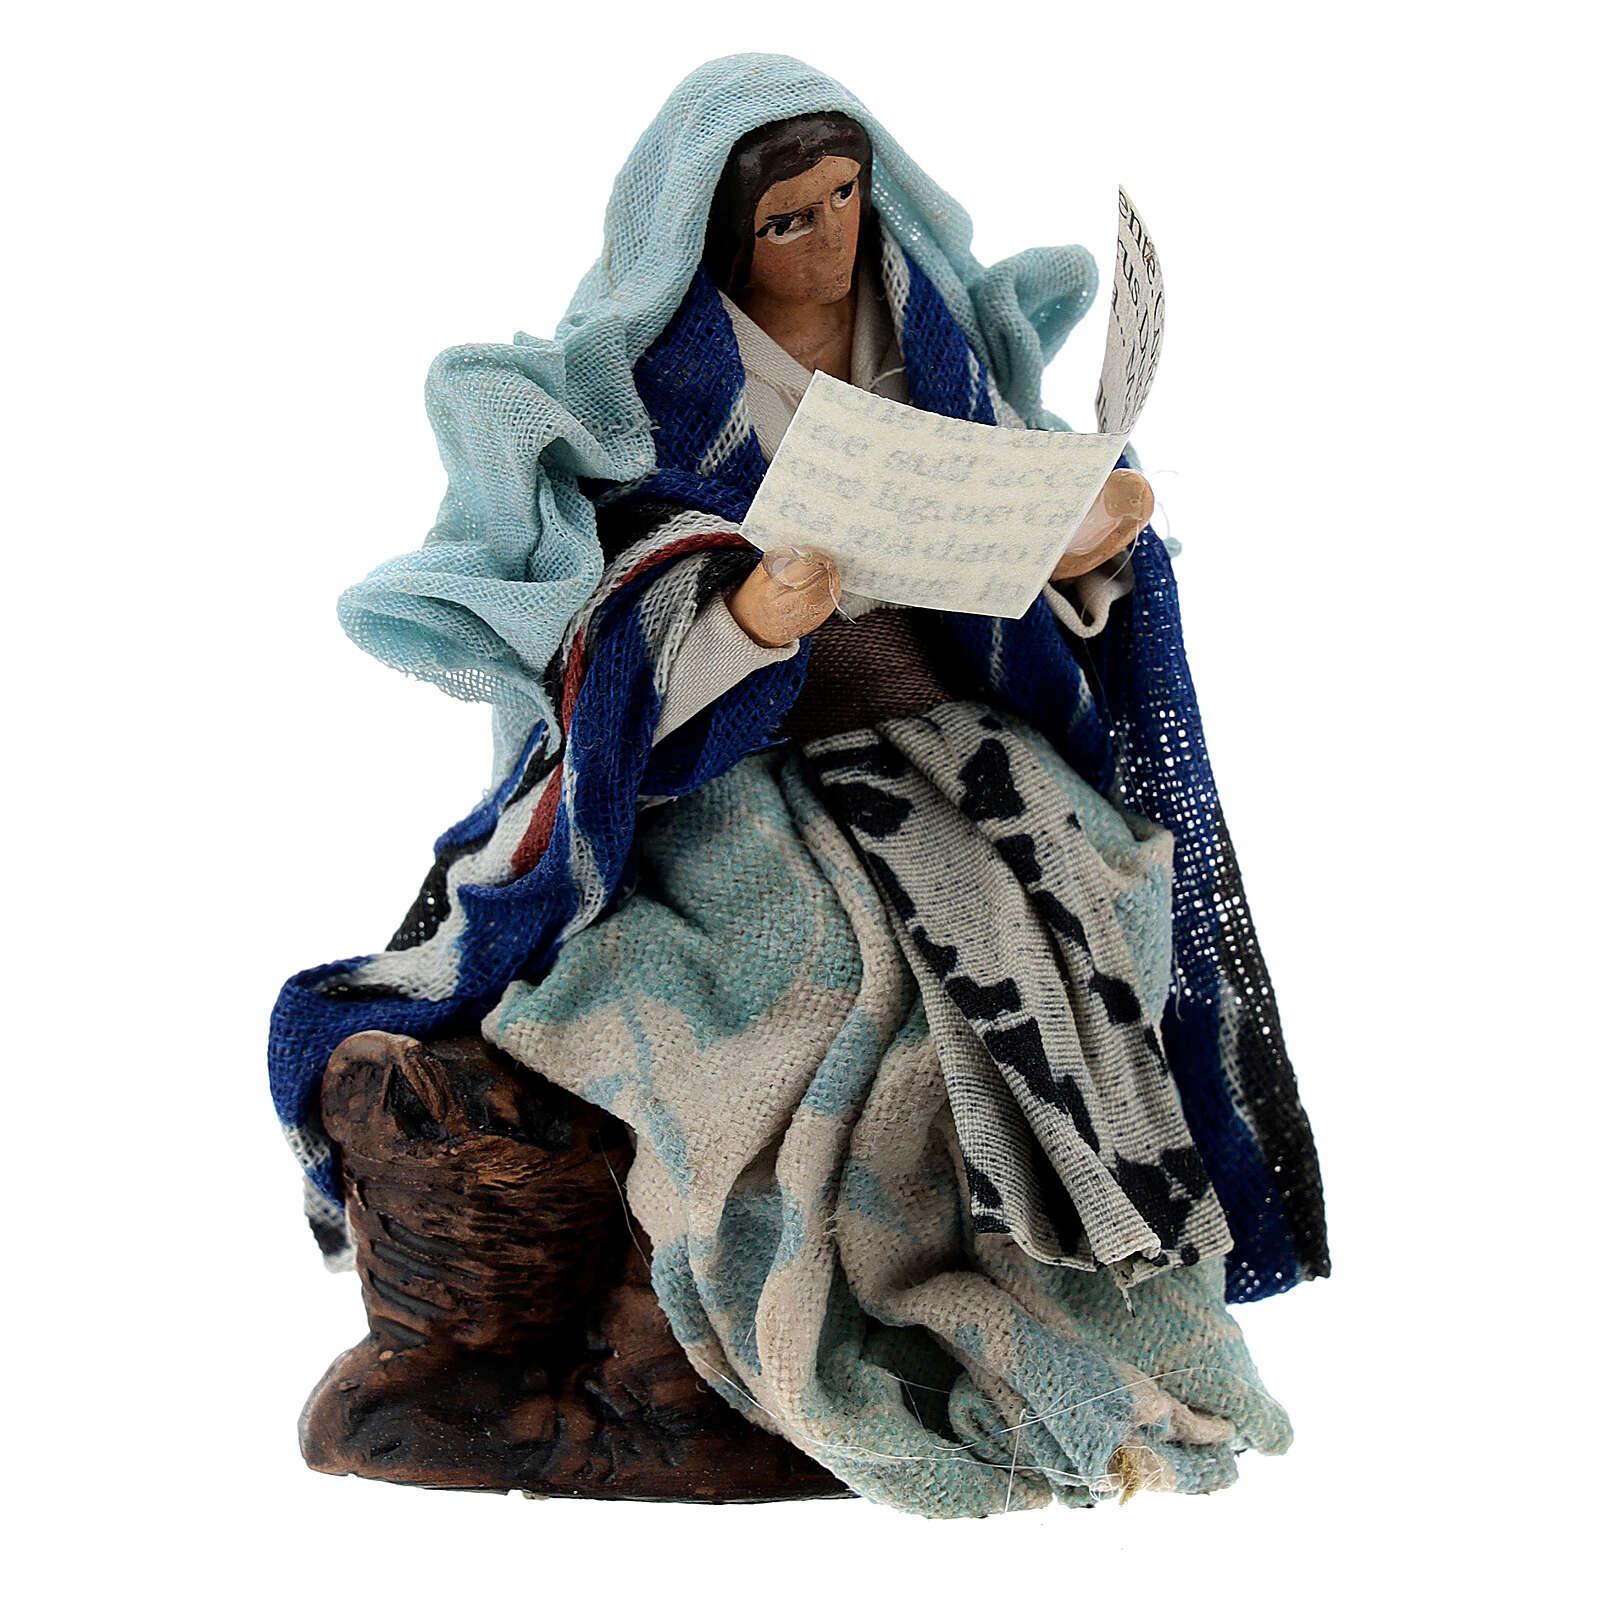 Donna con libro racconta storie presepe napoletano terracotta 8 cm 4